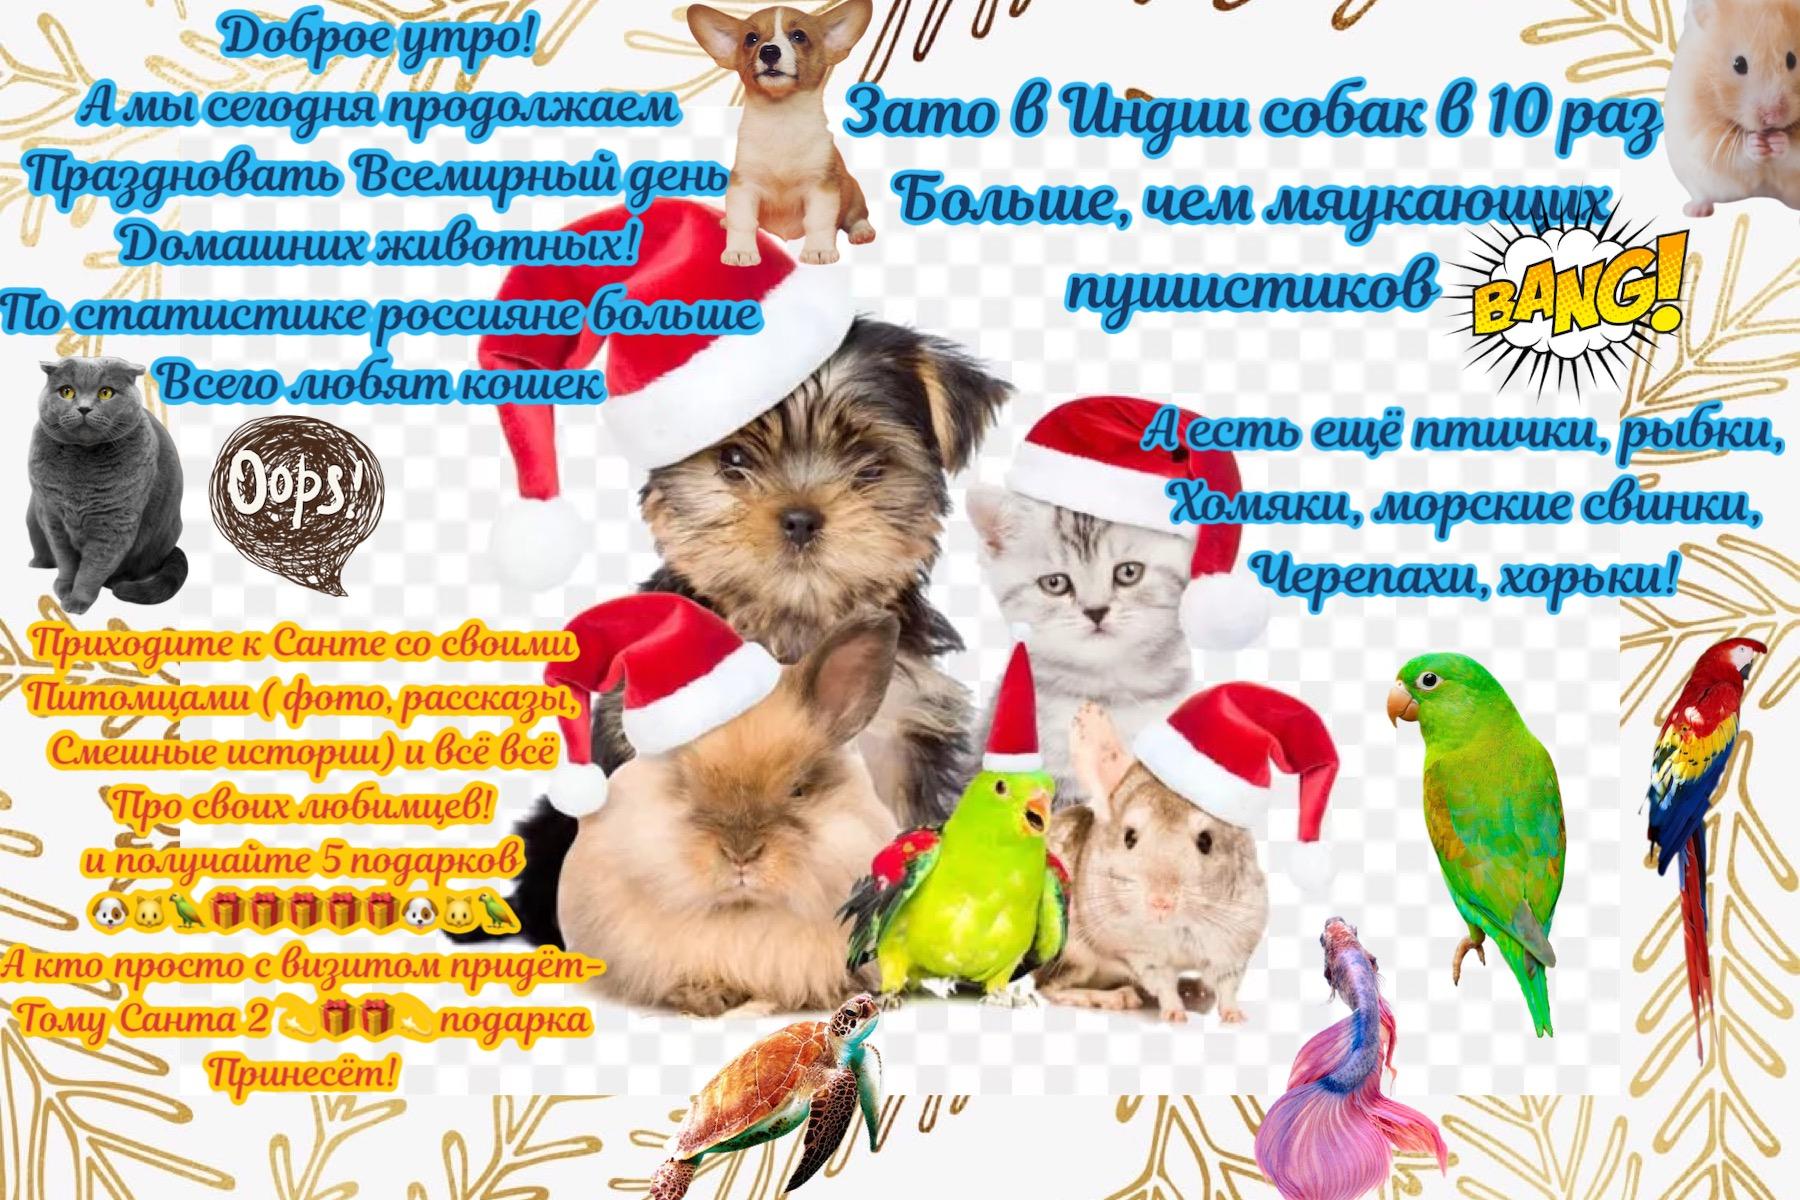 https://i3.imageban.ru/out/2019/12/01/cc94db0615985ab95723b23c03d57b9c.jpg